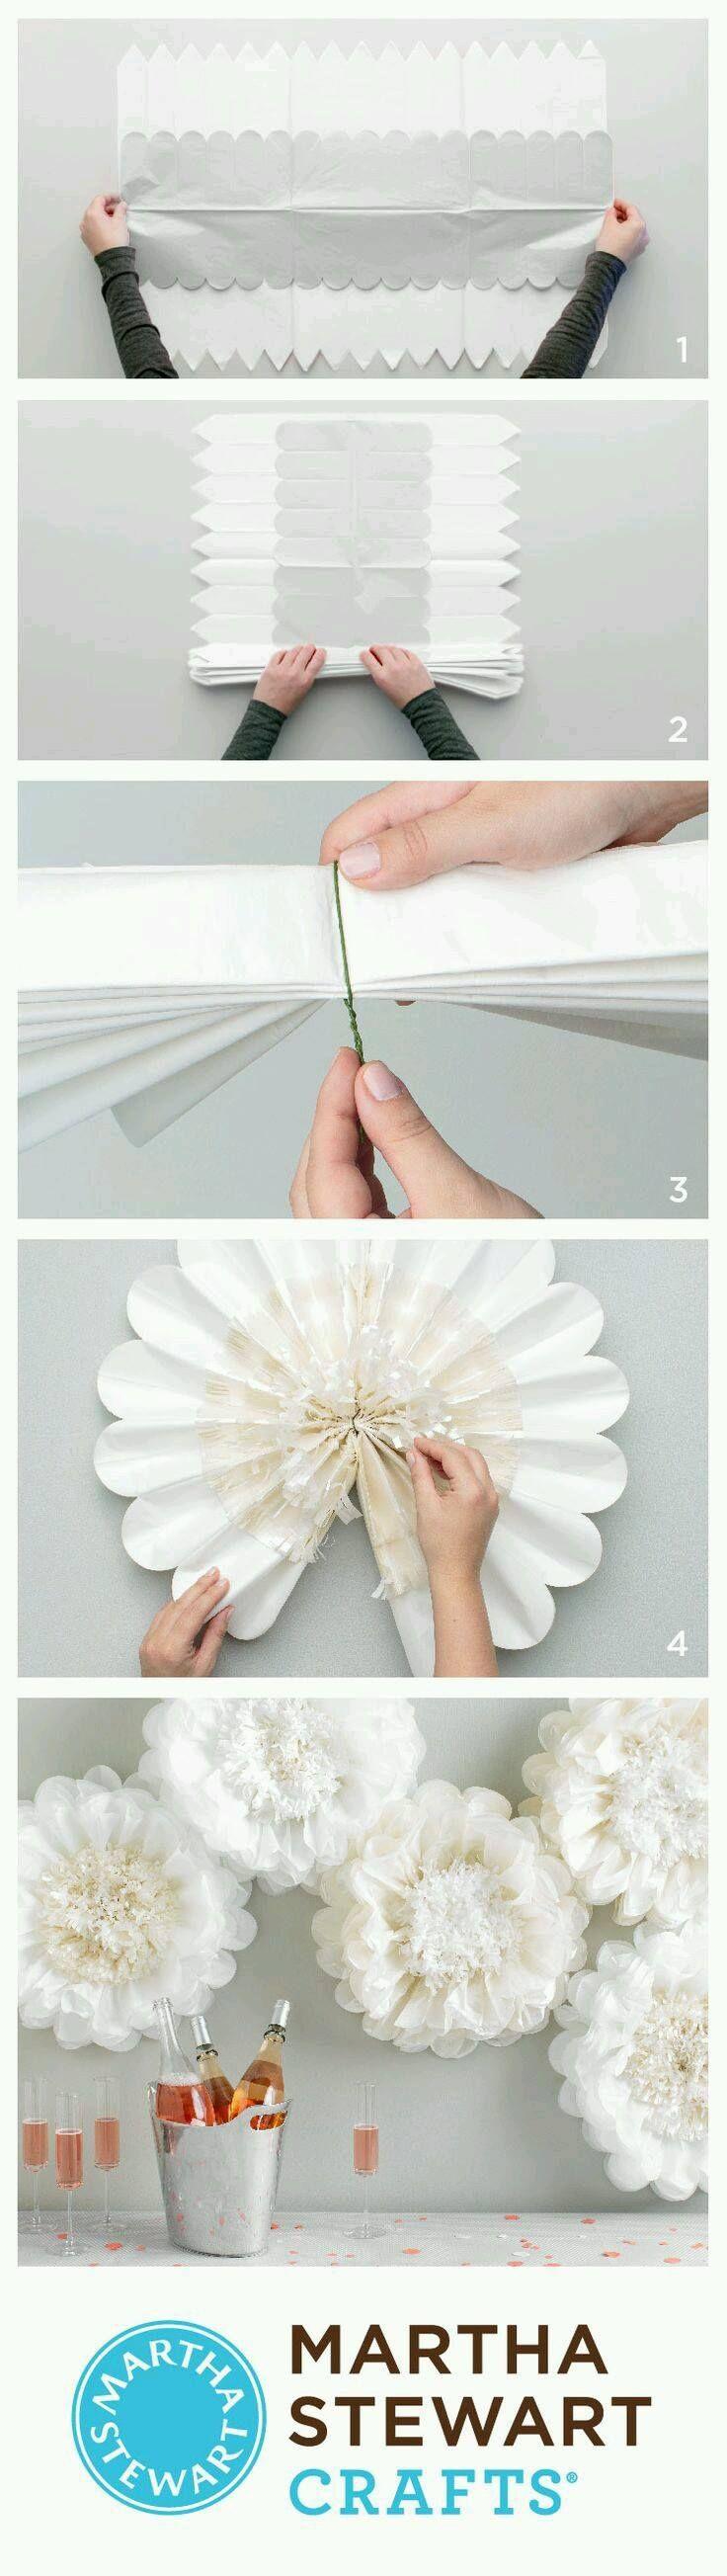 Tissue paper or crepe paper